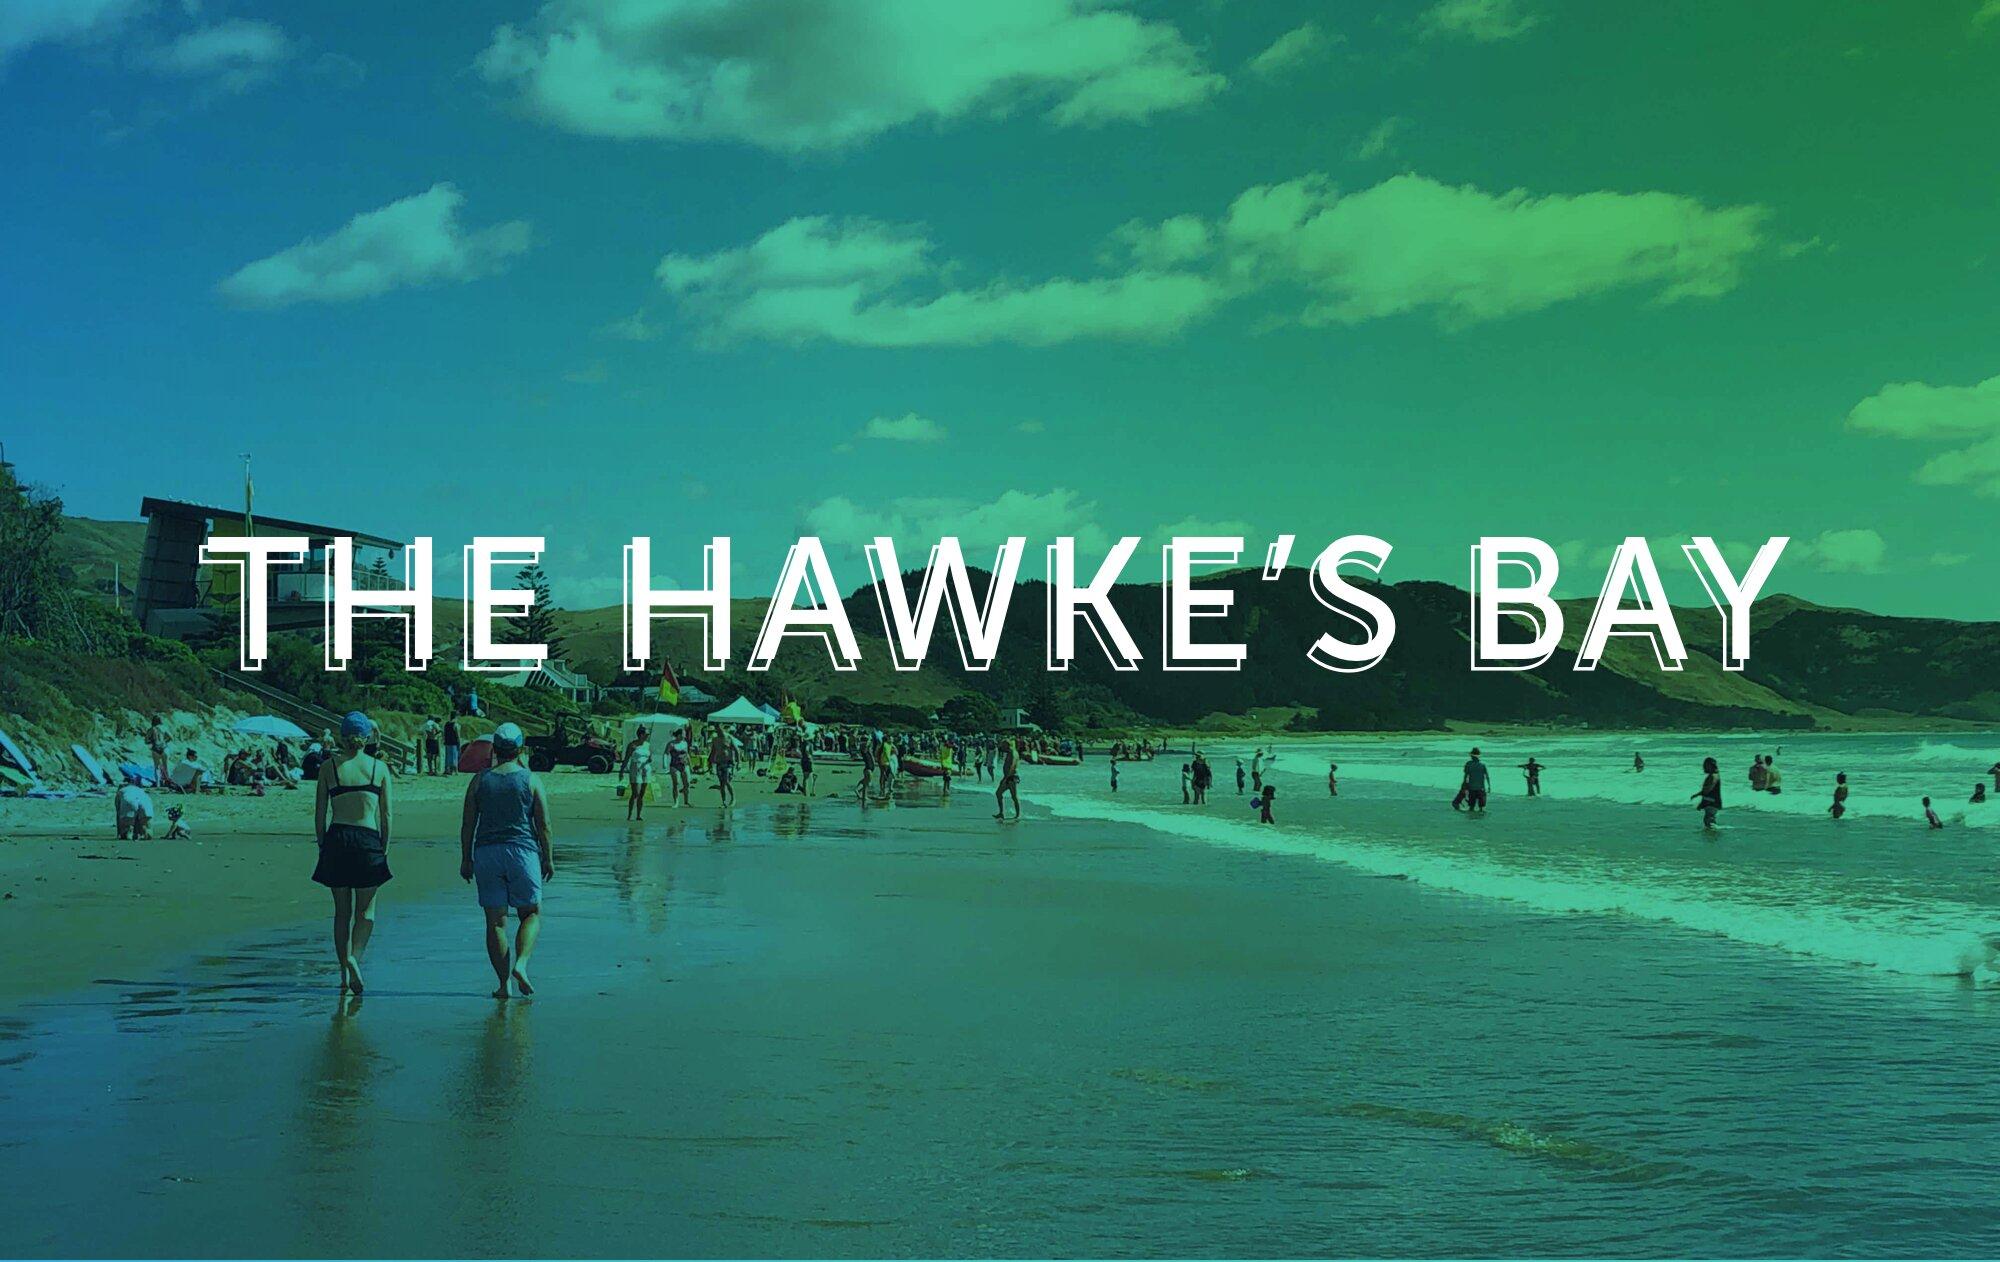 The Hawke's Bay